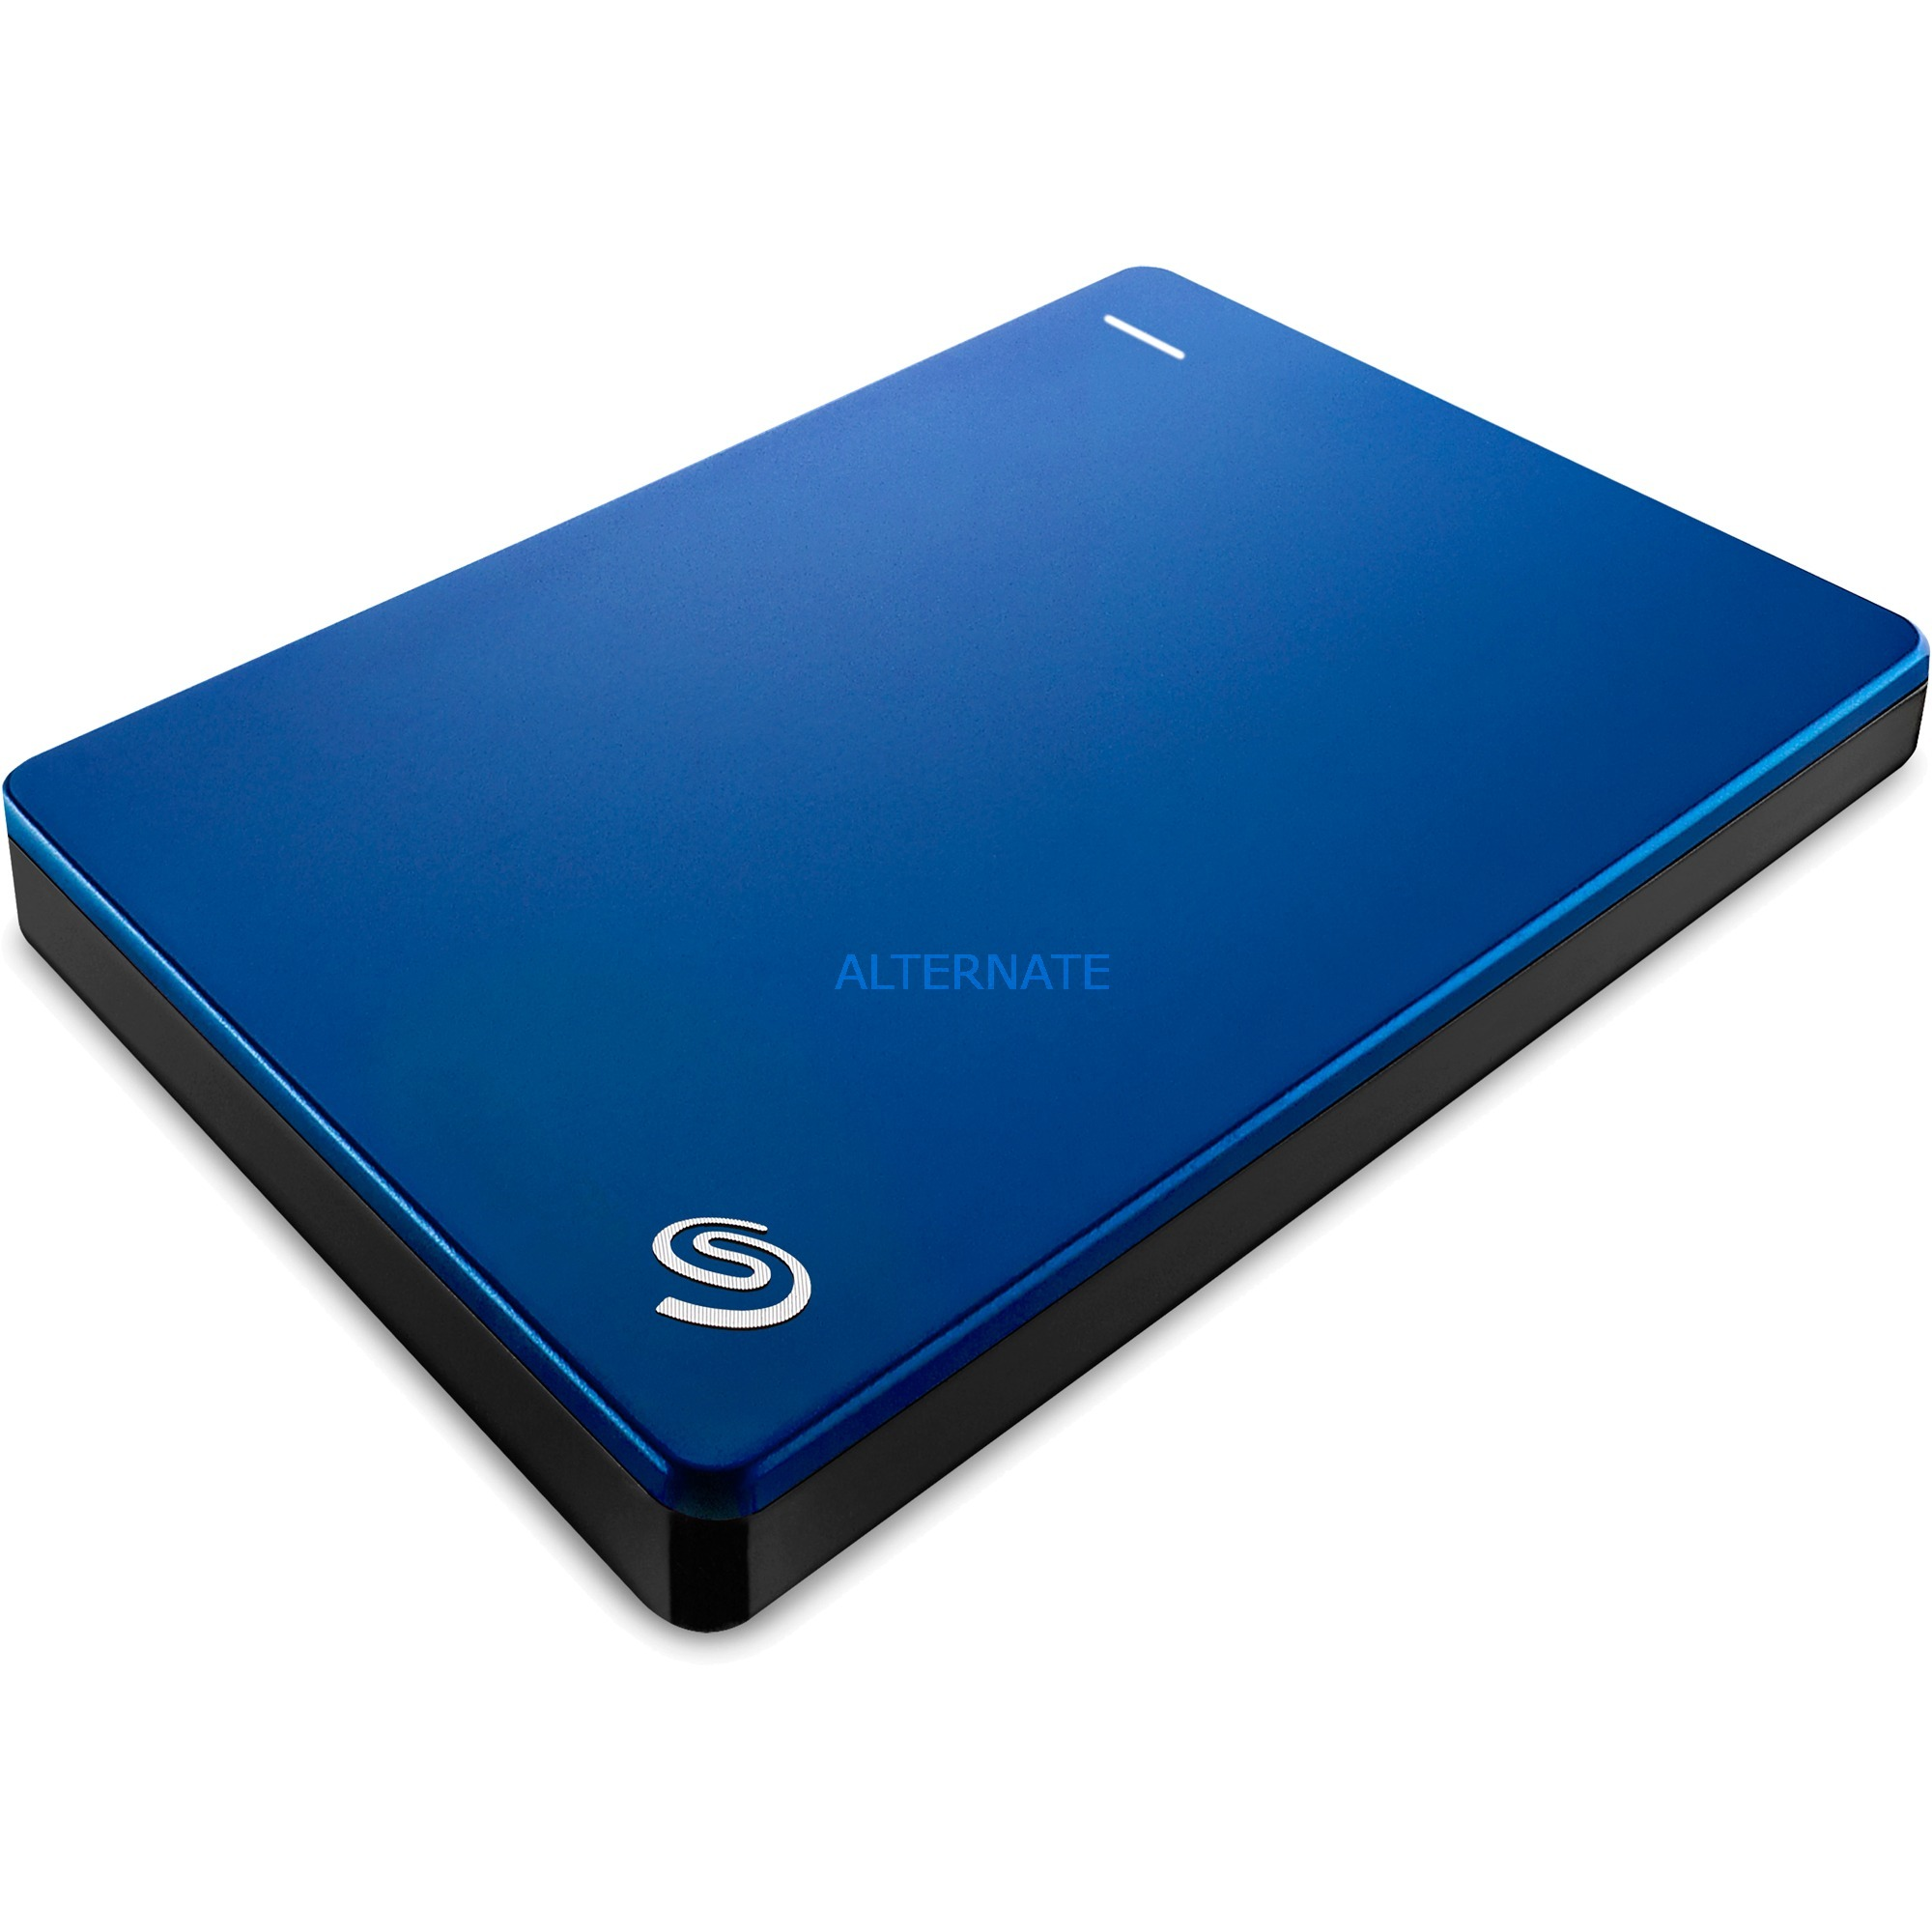 Backup Plus Slim 1TB disco duro externo 1000 GB Azul, Unidad de disco duro